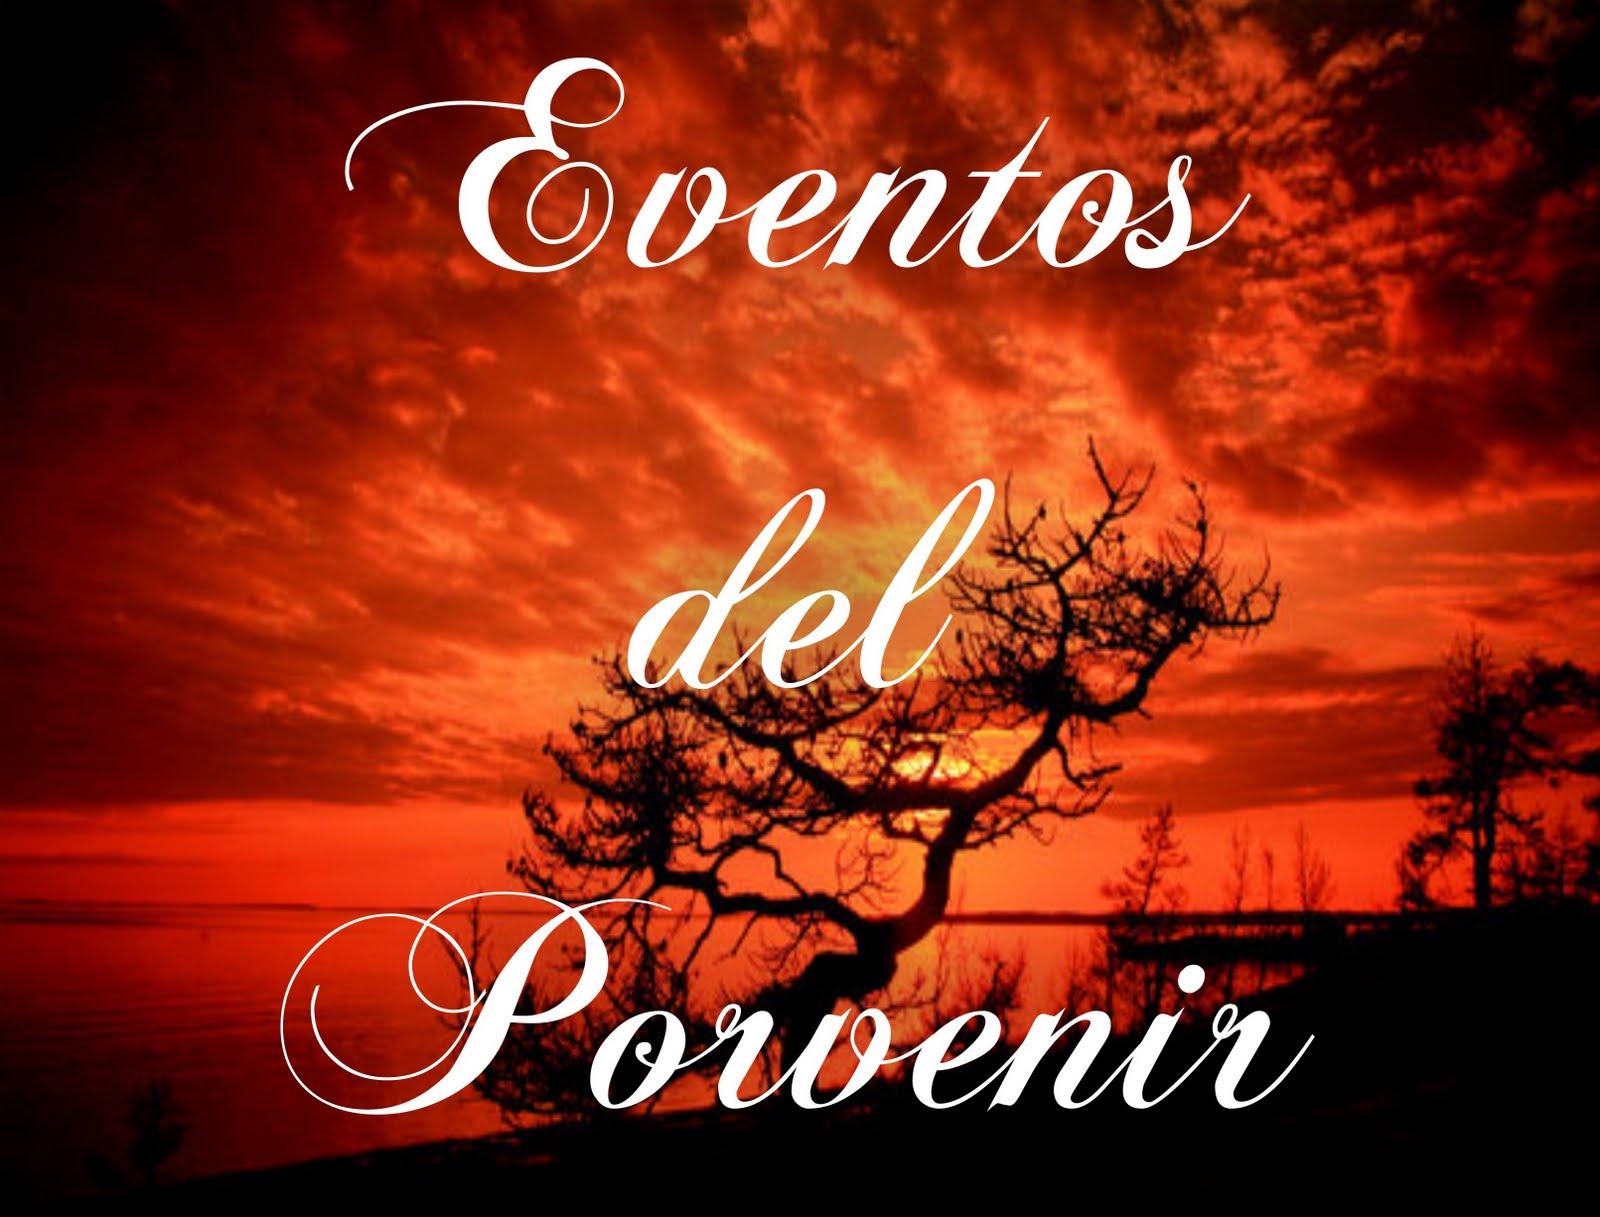 Eventos del porvenir dwight pentecost